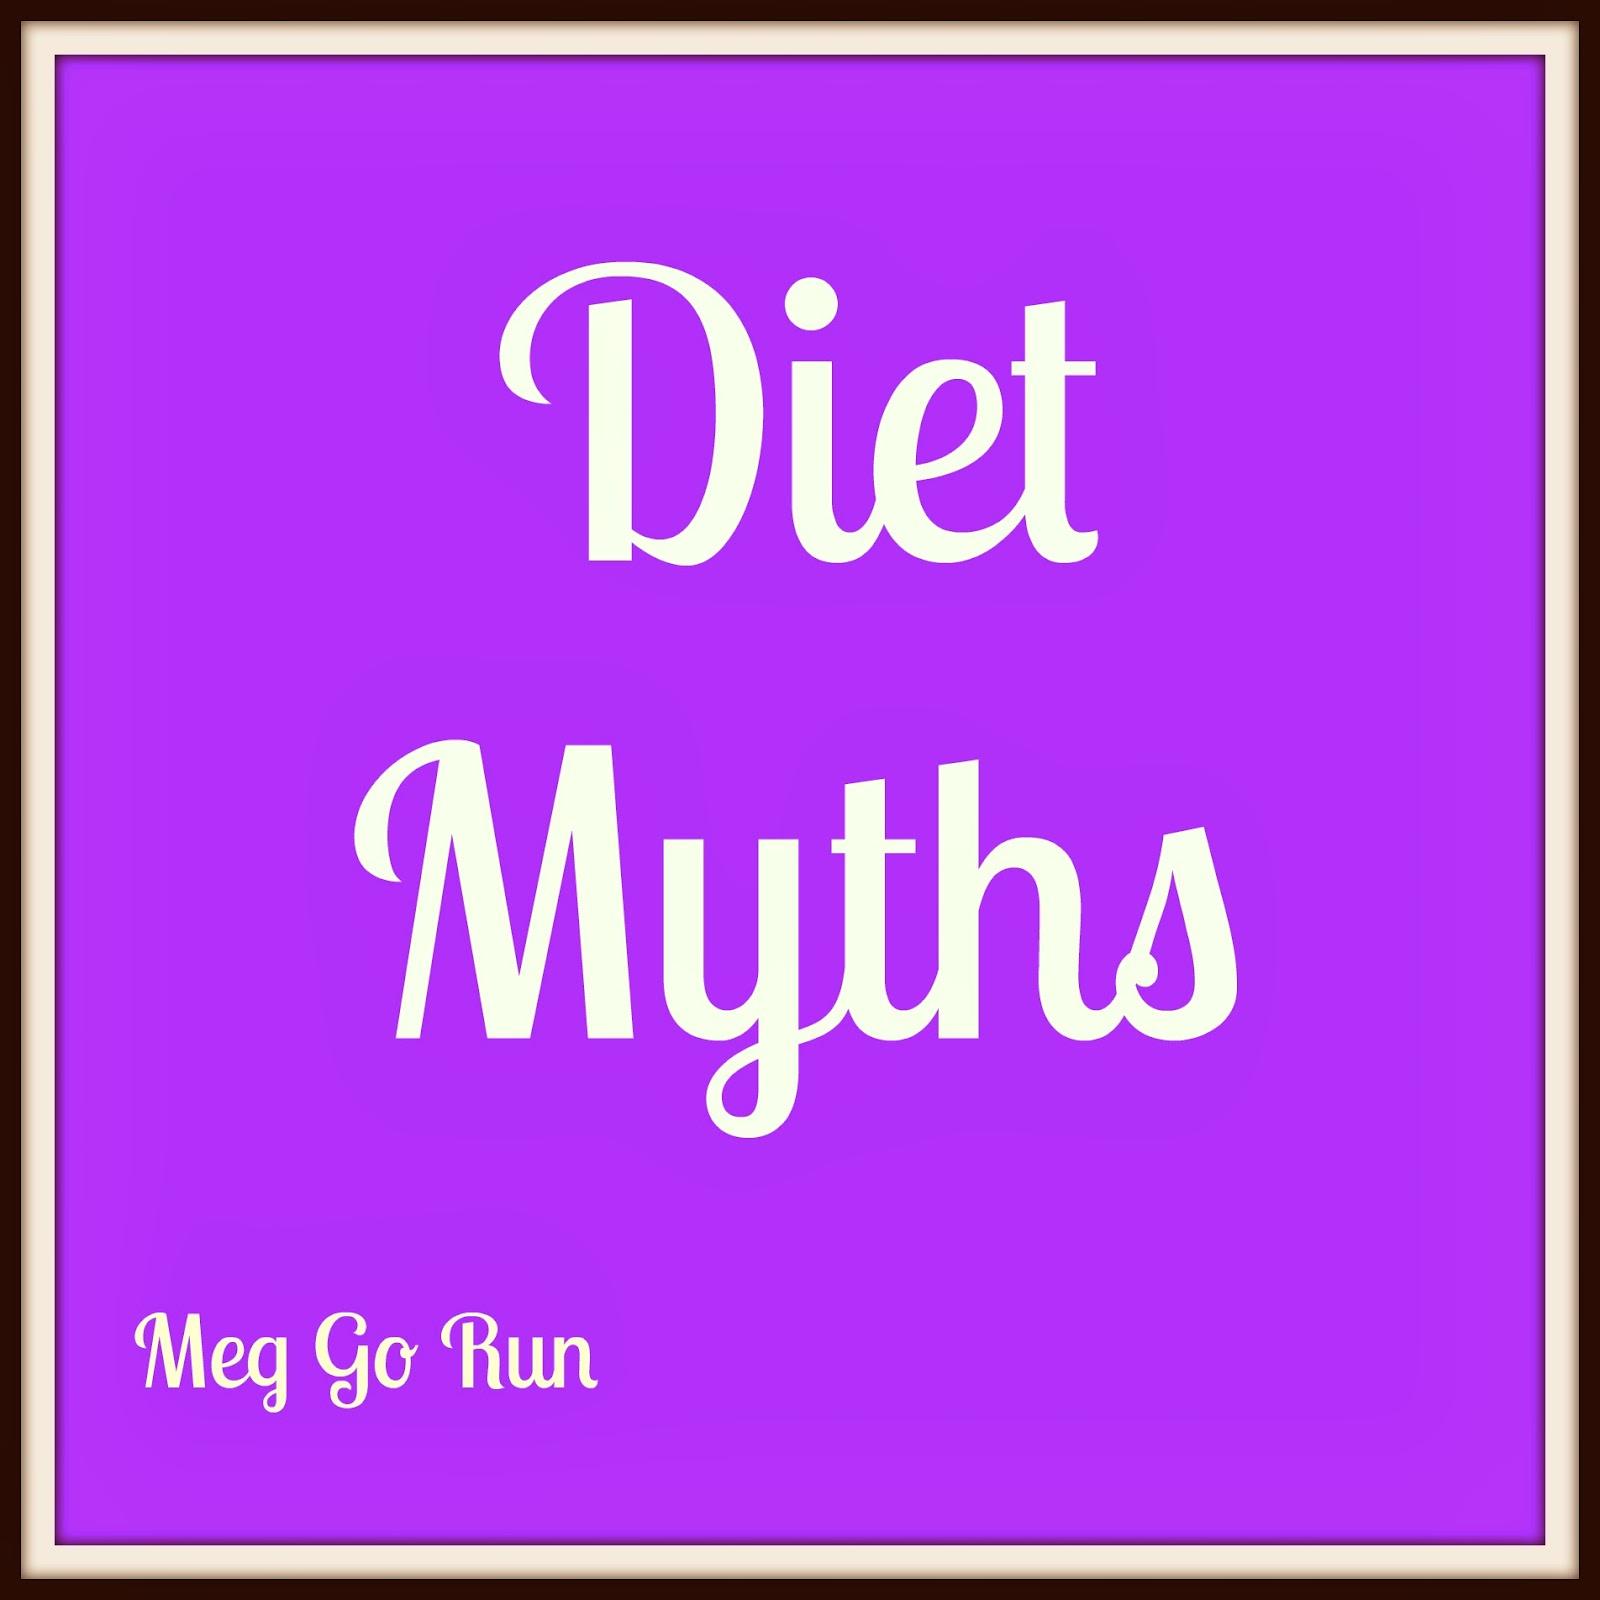 Meg Go Run: Eating Fat Makes You Fat- DIET MYTHS!